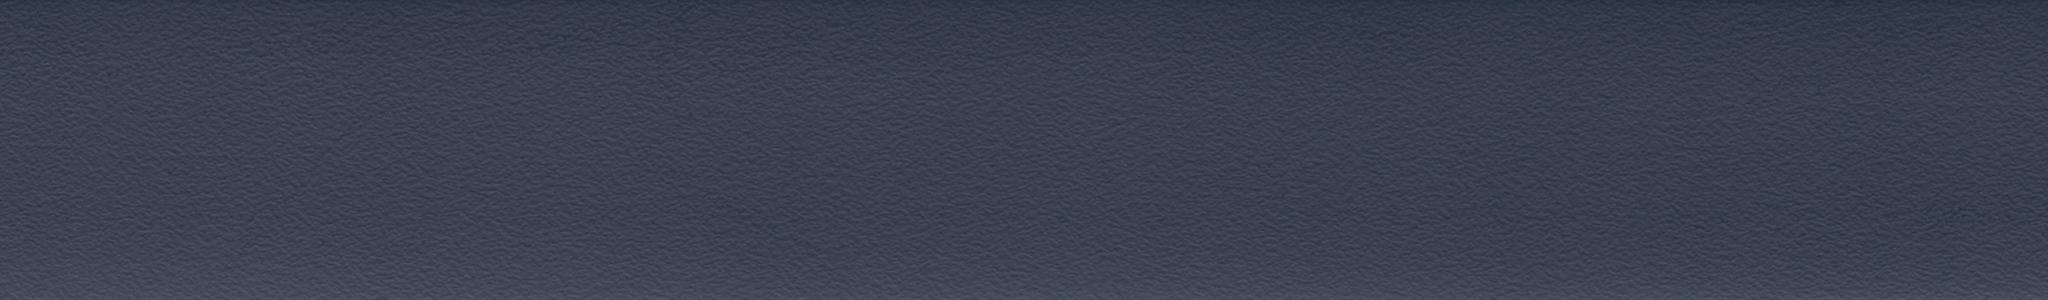 HU 150599 ABS hrana Indigo modrá perla XG